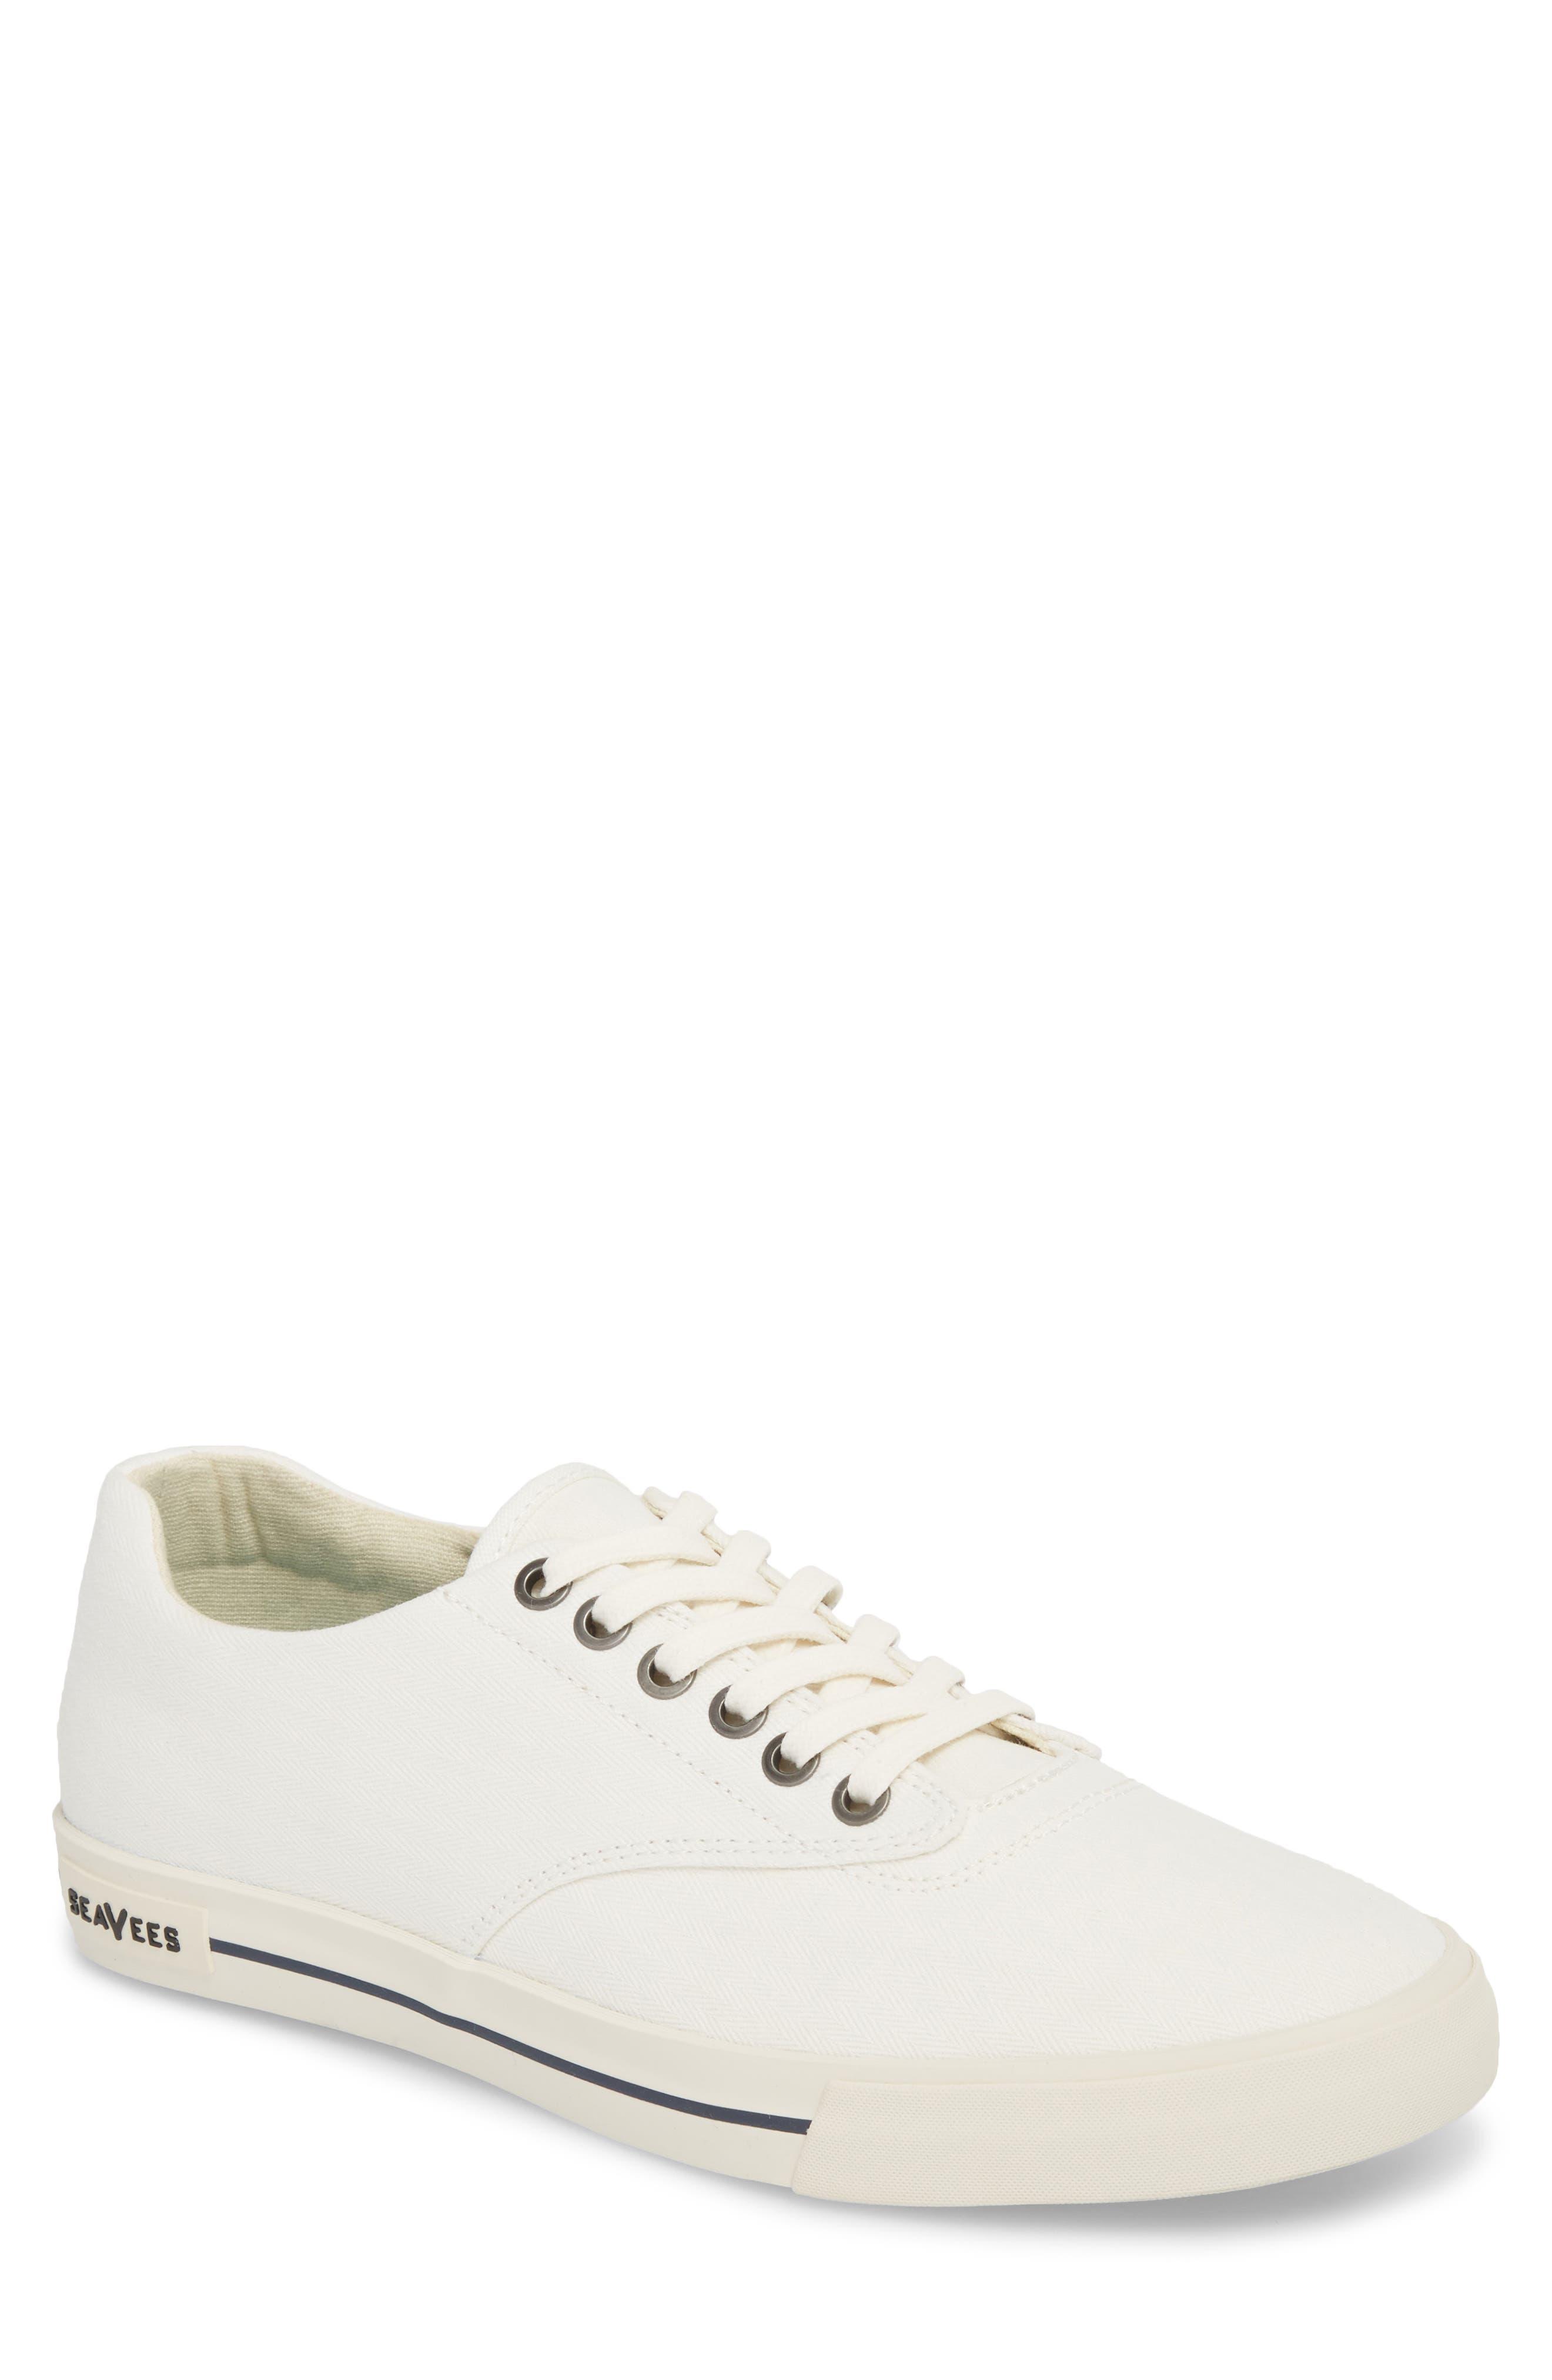 SEAVEES Hermosa Plimsoll Sneaker, Main, color, 125